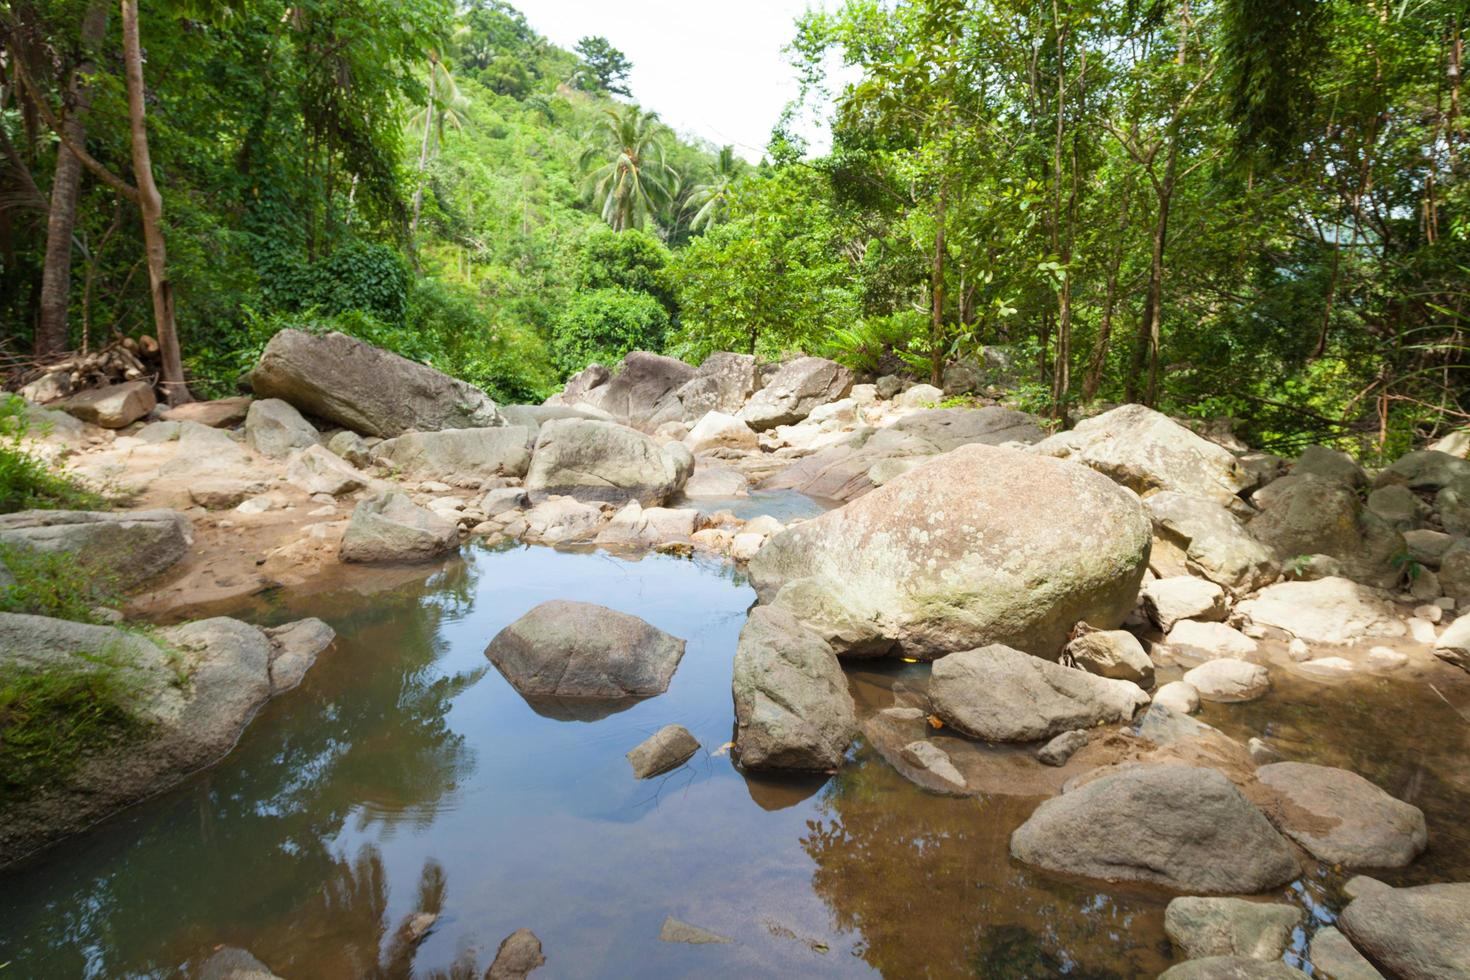 fiume a koh samui, thailandia foto